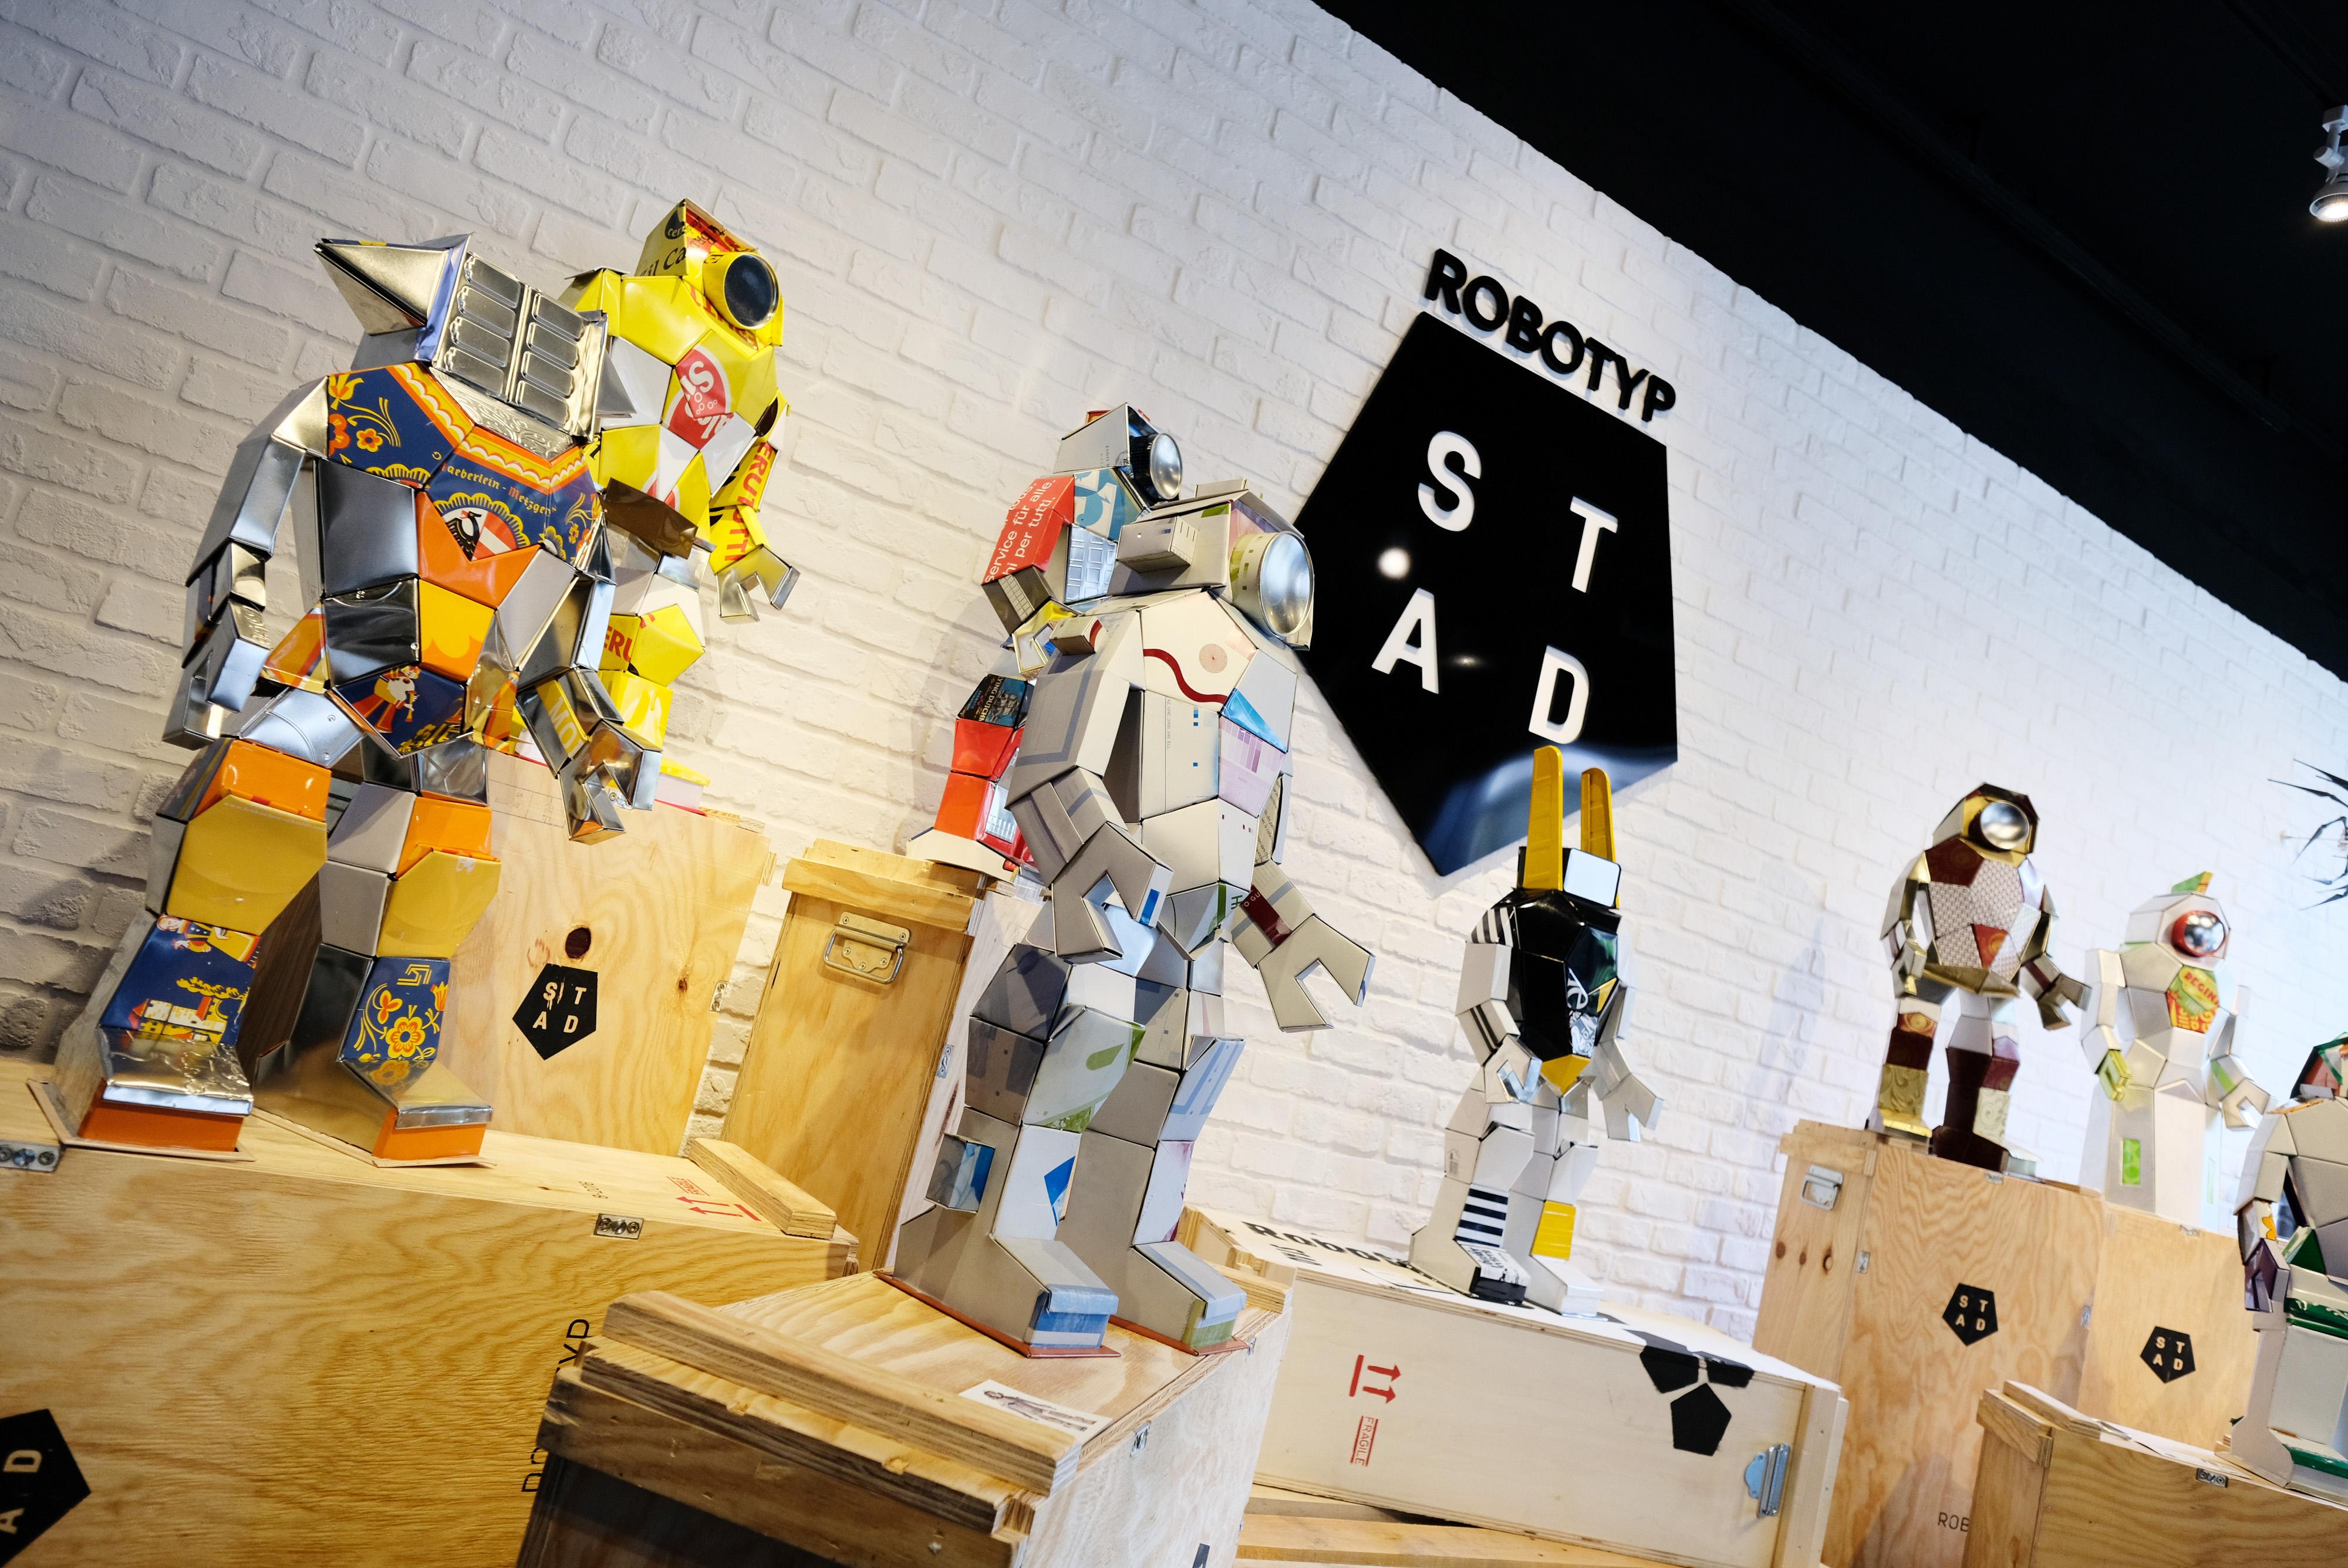 Robotyp 1-2015